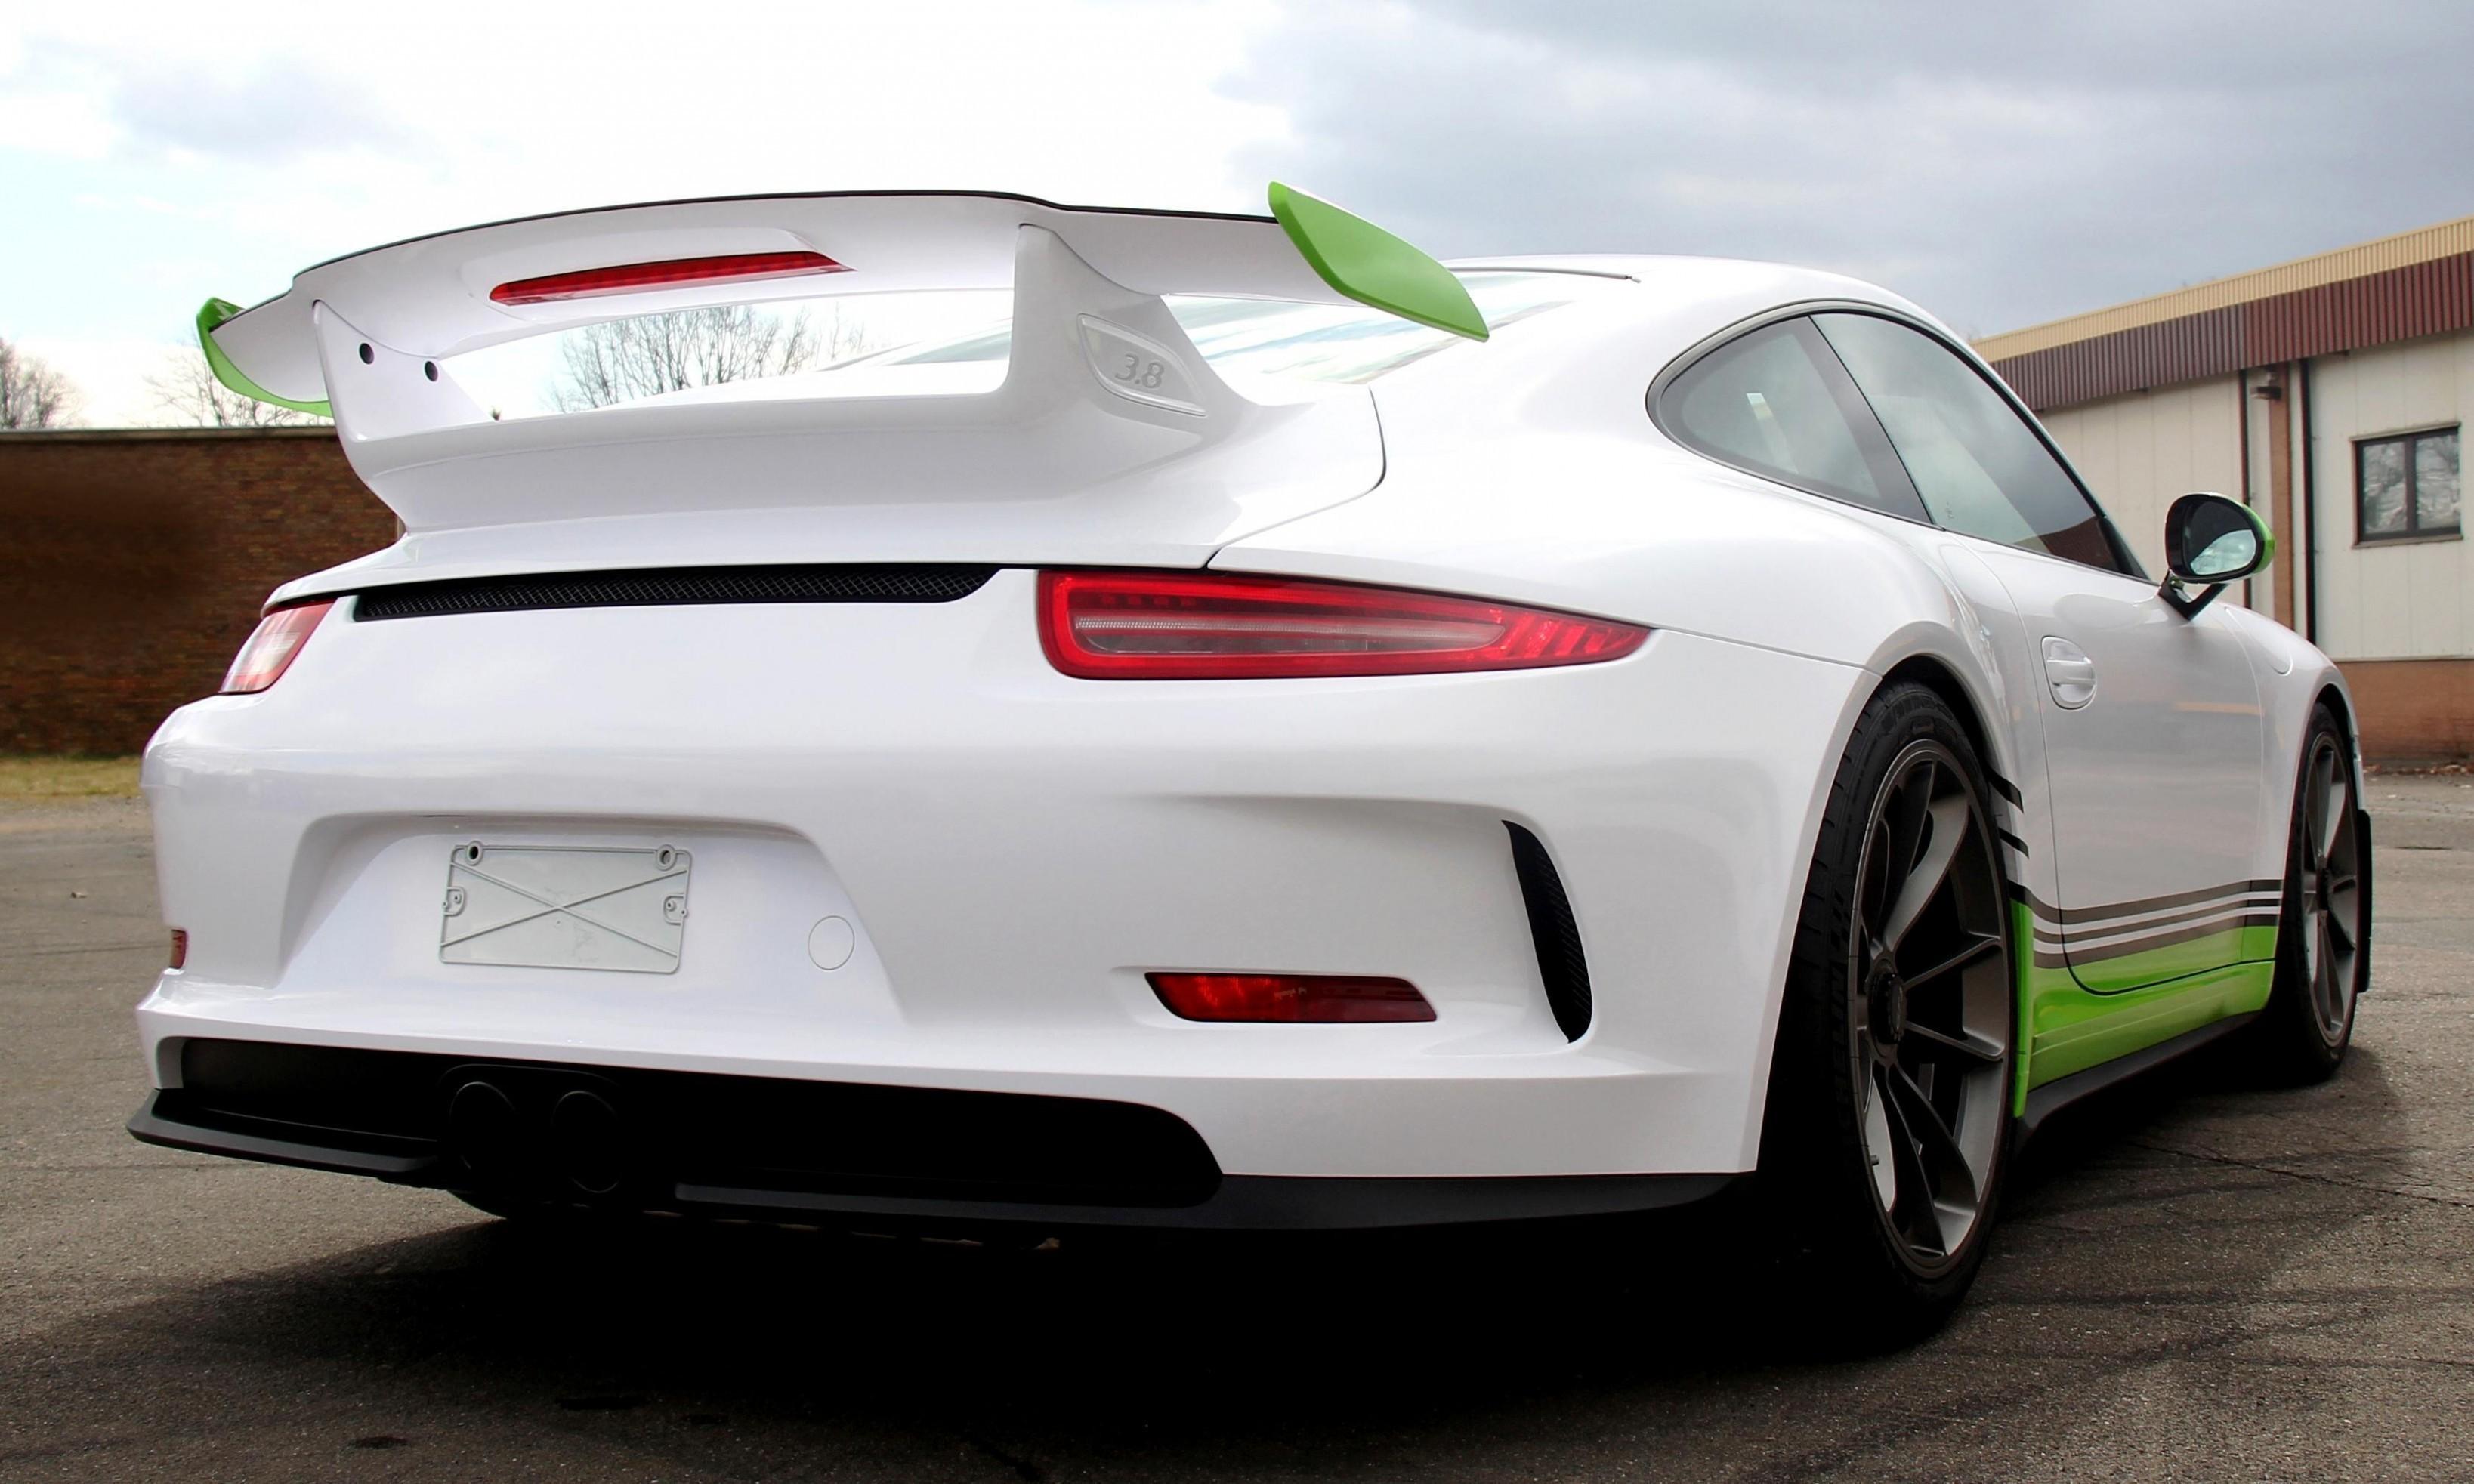 FOSTLA de Shows Artful Porsche 911 GT3 Foil Wrap Design and Execution